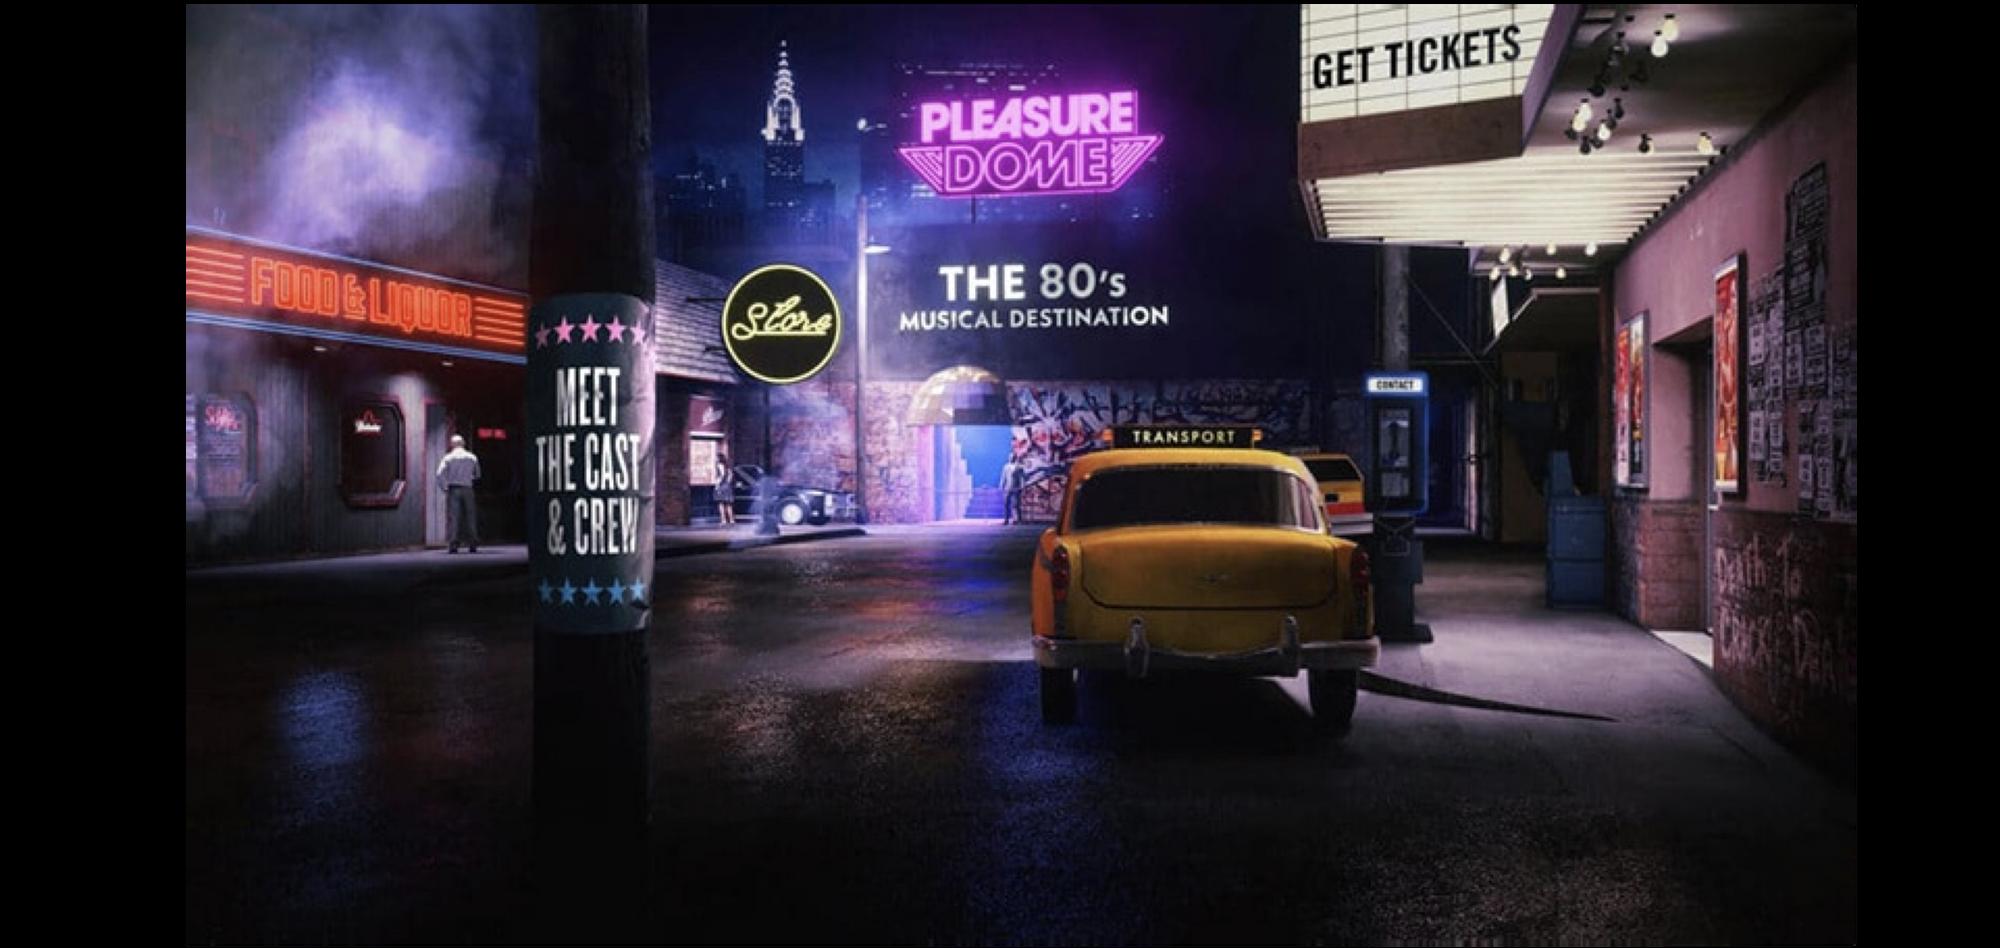 Pleasuredome The Musical - digital marketing